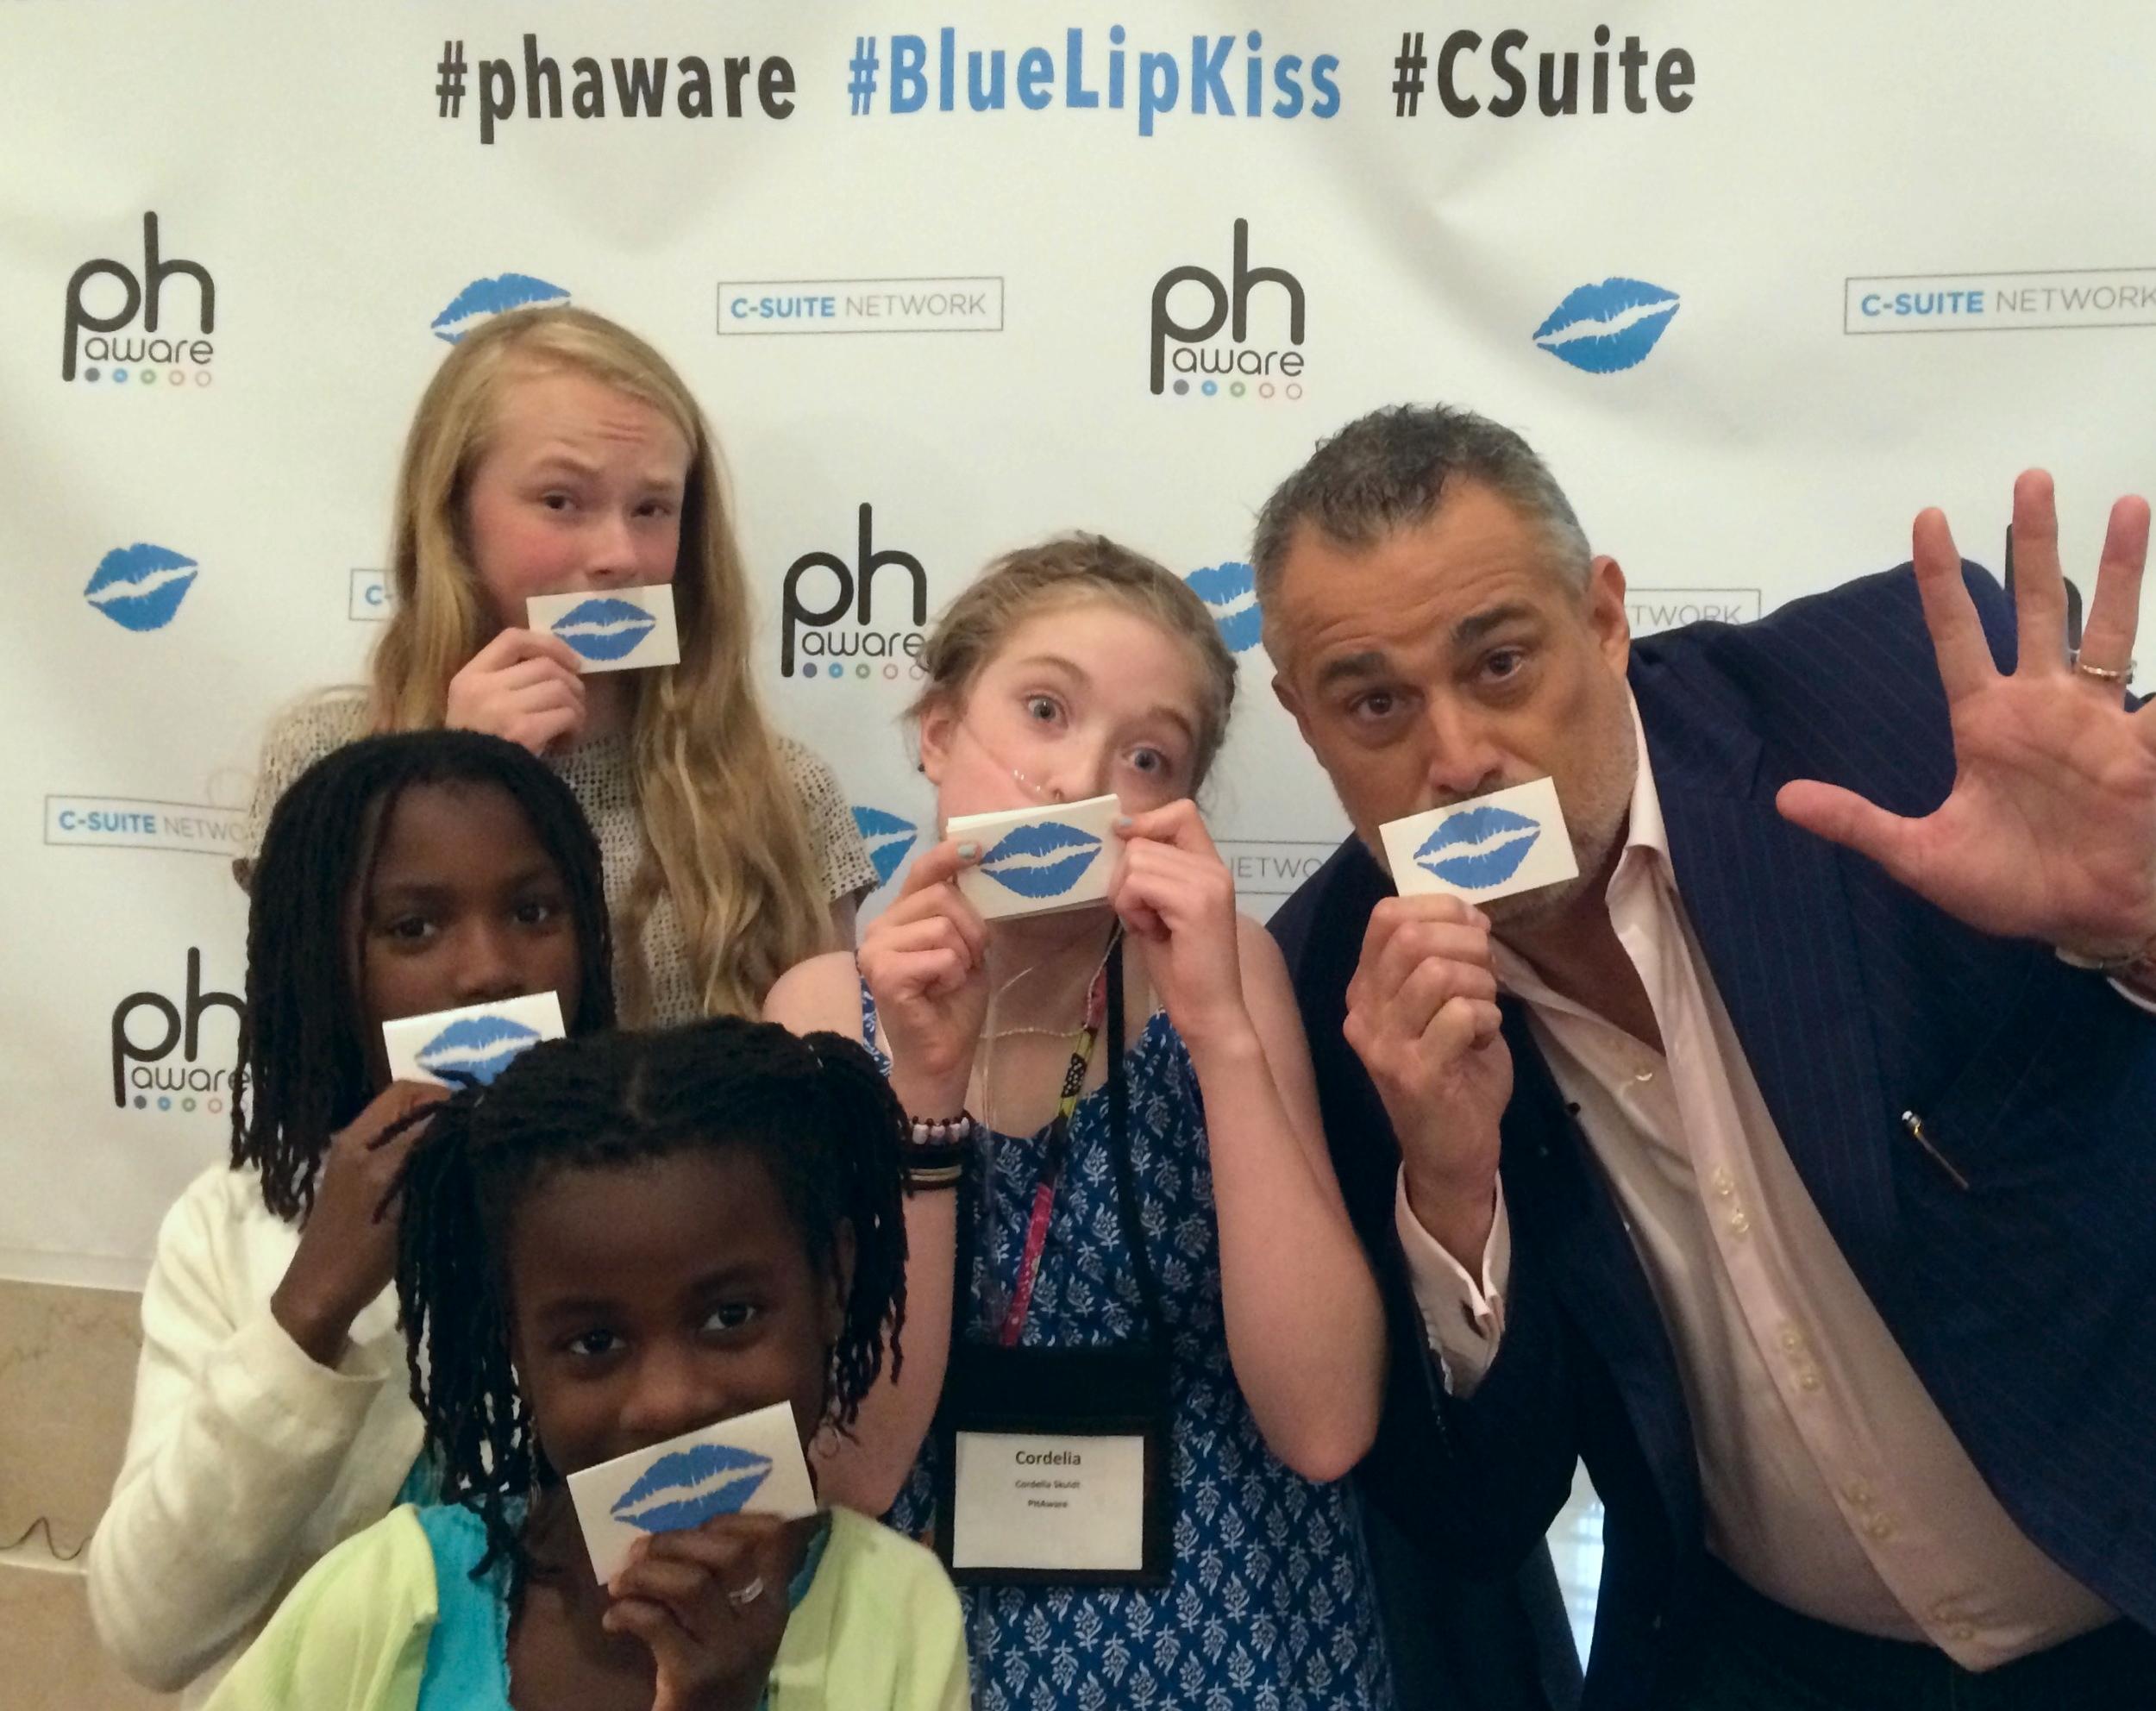 PH patient Cordelia Skuldt (center) and friends enlistJeffrey Hayzlett and hisC-Suite Network to take the #BlueLipKiss Challenge.